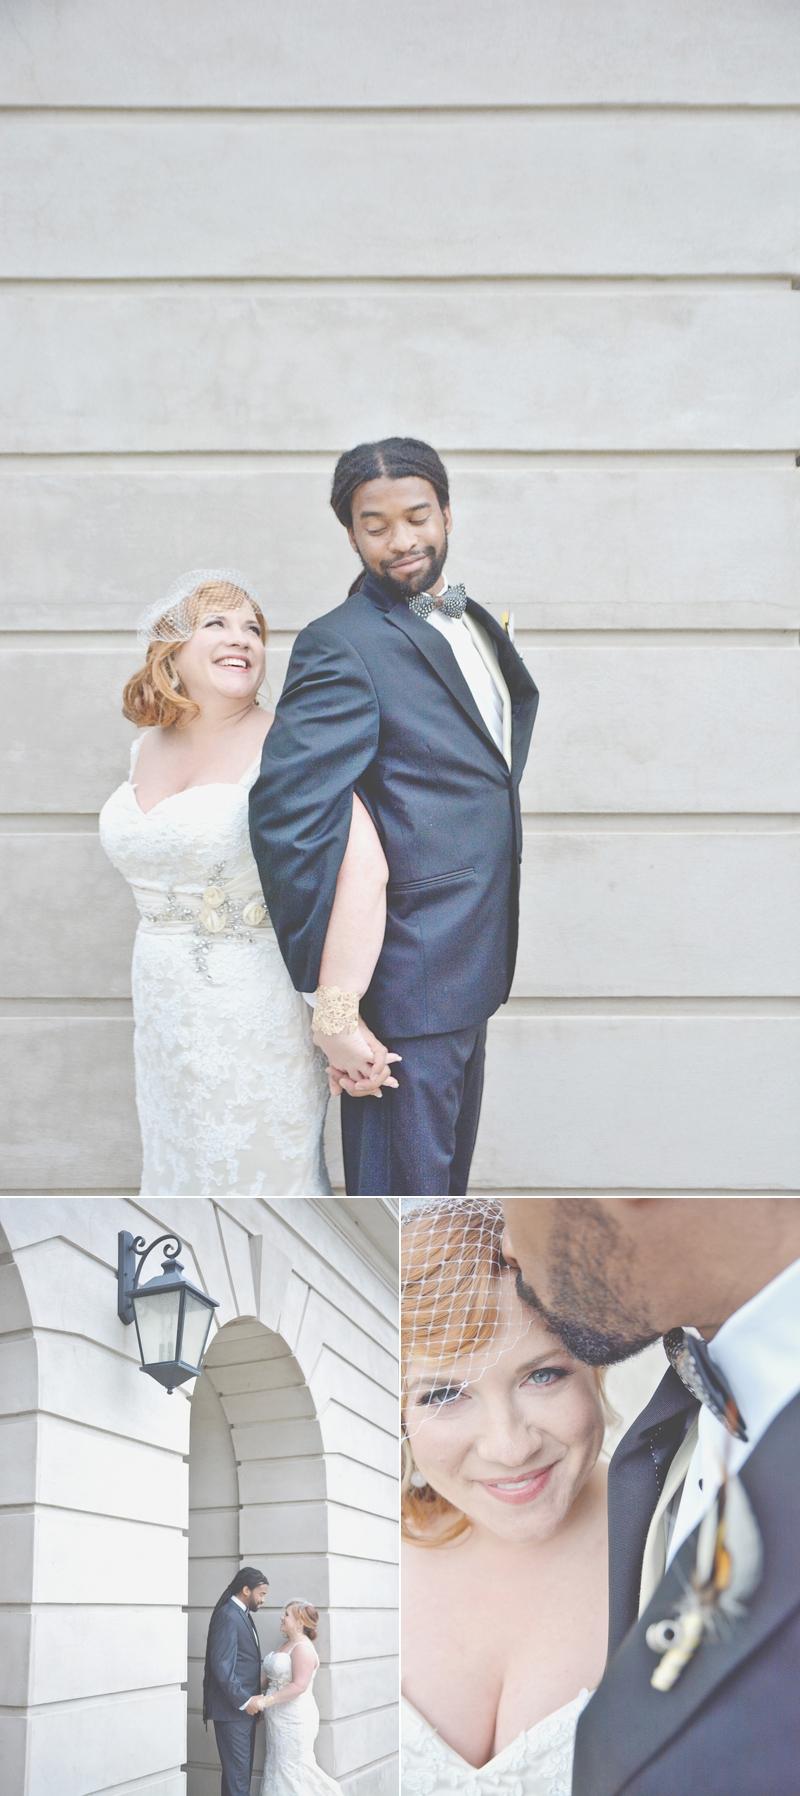 Wedding at The Big Studio at King Plow - Six Hearts Photography10